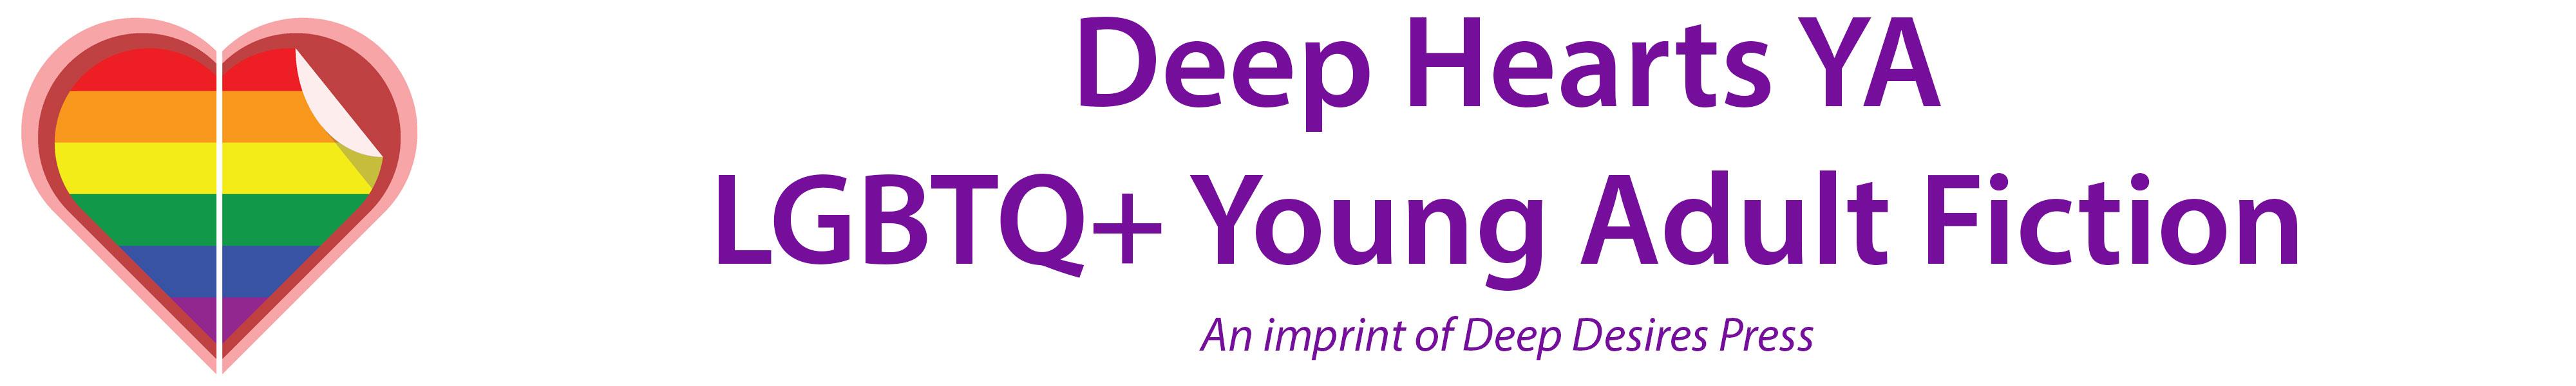 Deep Hearts YA